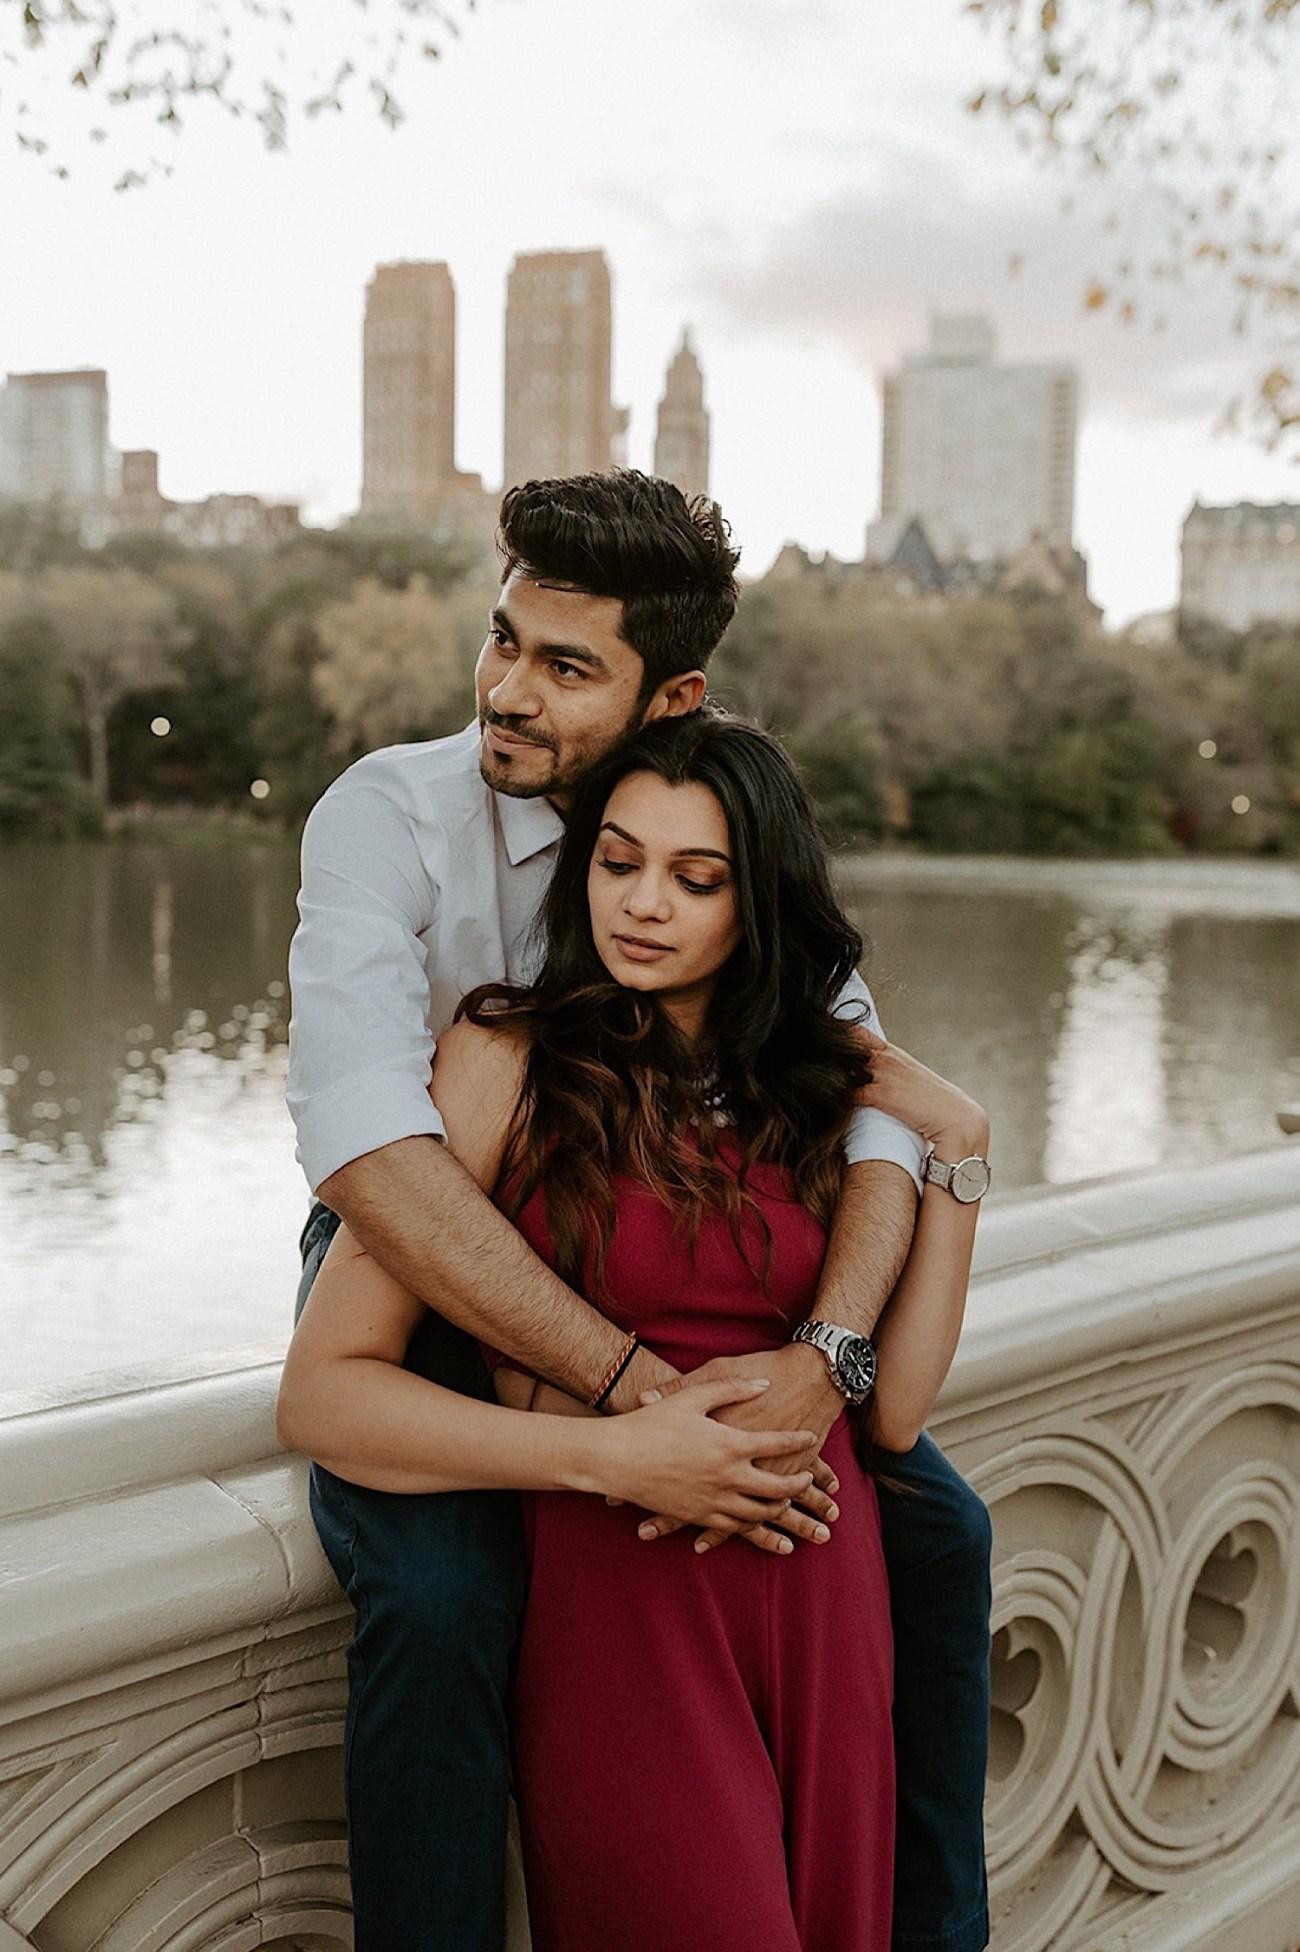 075 Central Park Proposal Photos Bethesda Terrace Engagement Photos New York Wedding Photographer